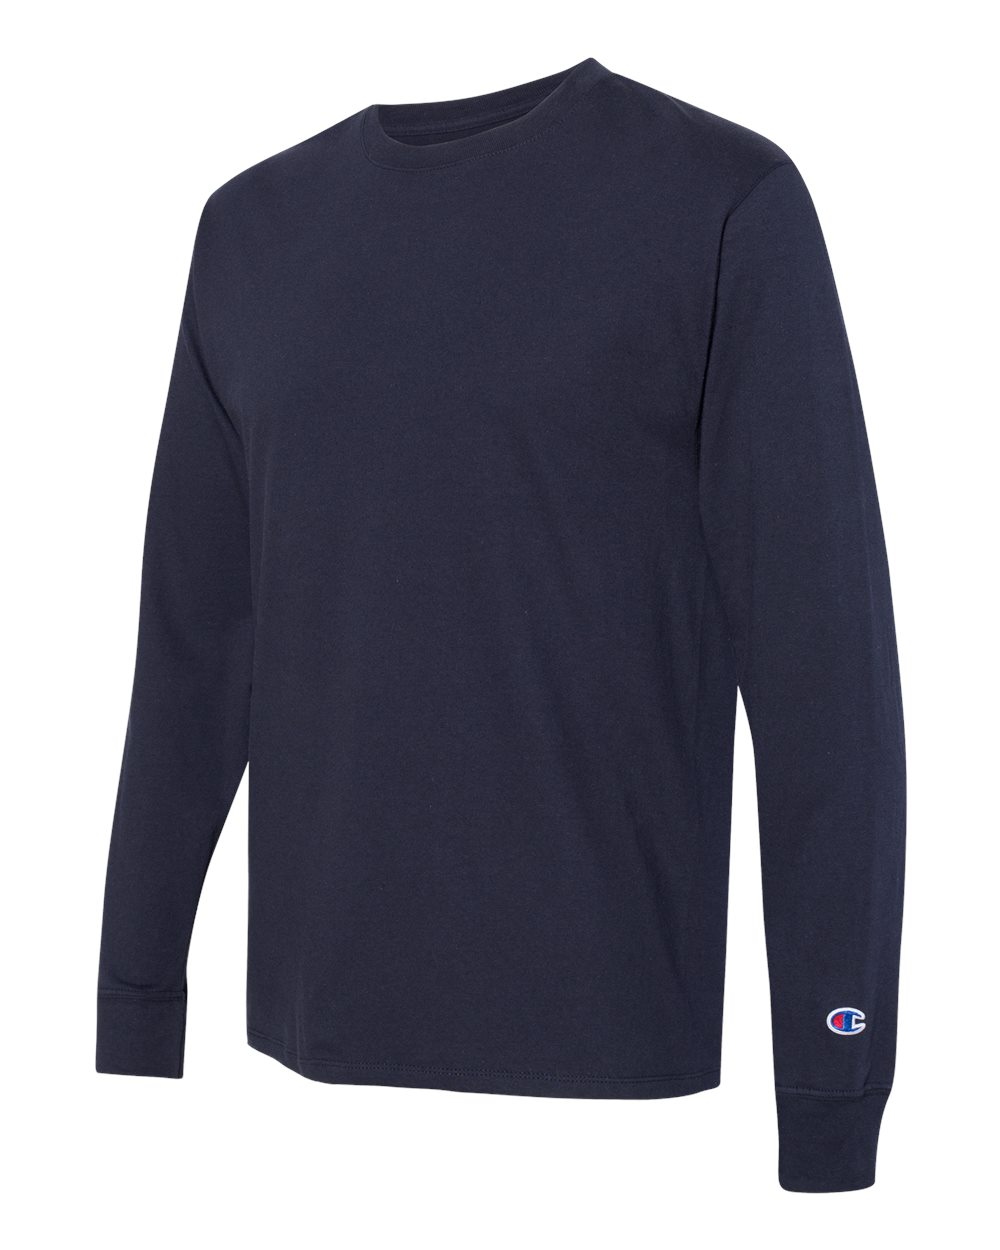 7fbecacd Champion CP15 - Premium Fashion Classics Long Sleeve T-Shirt $8.74 ...